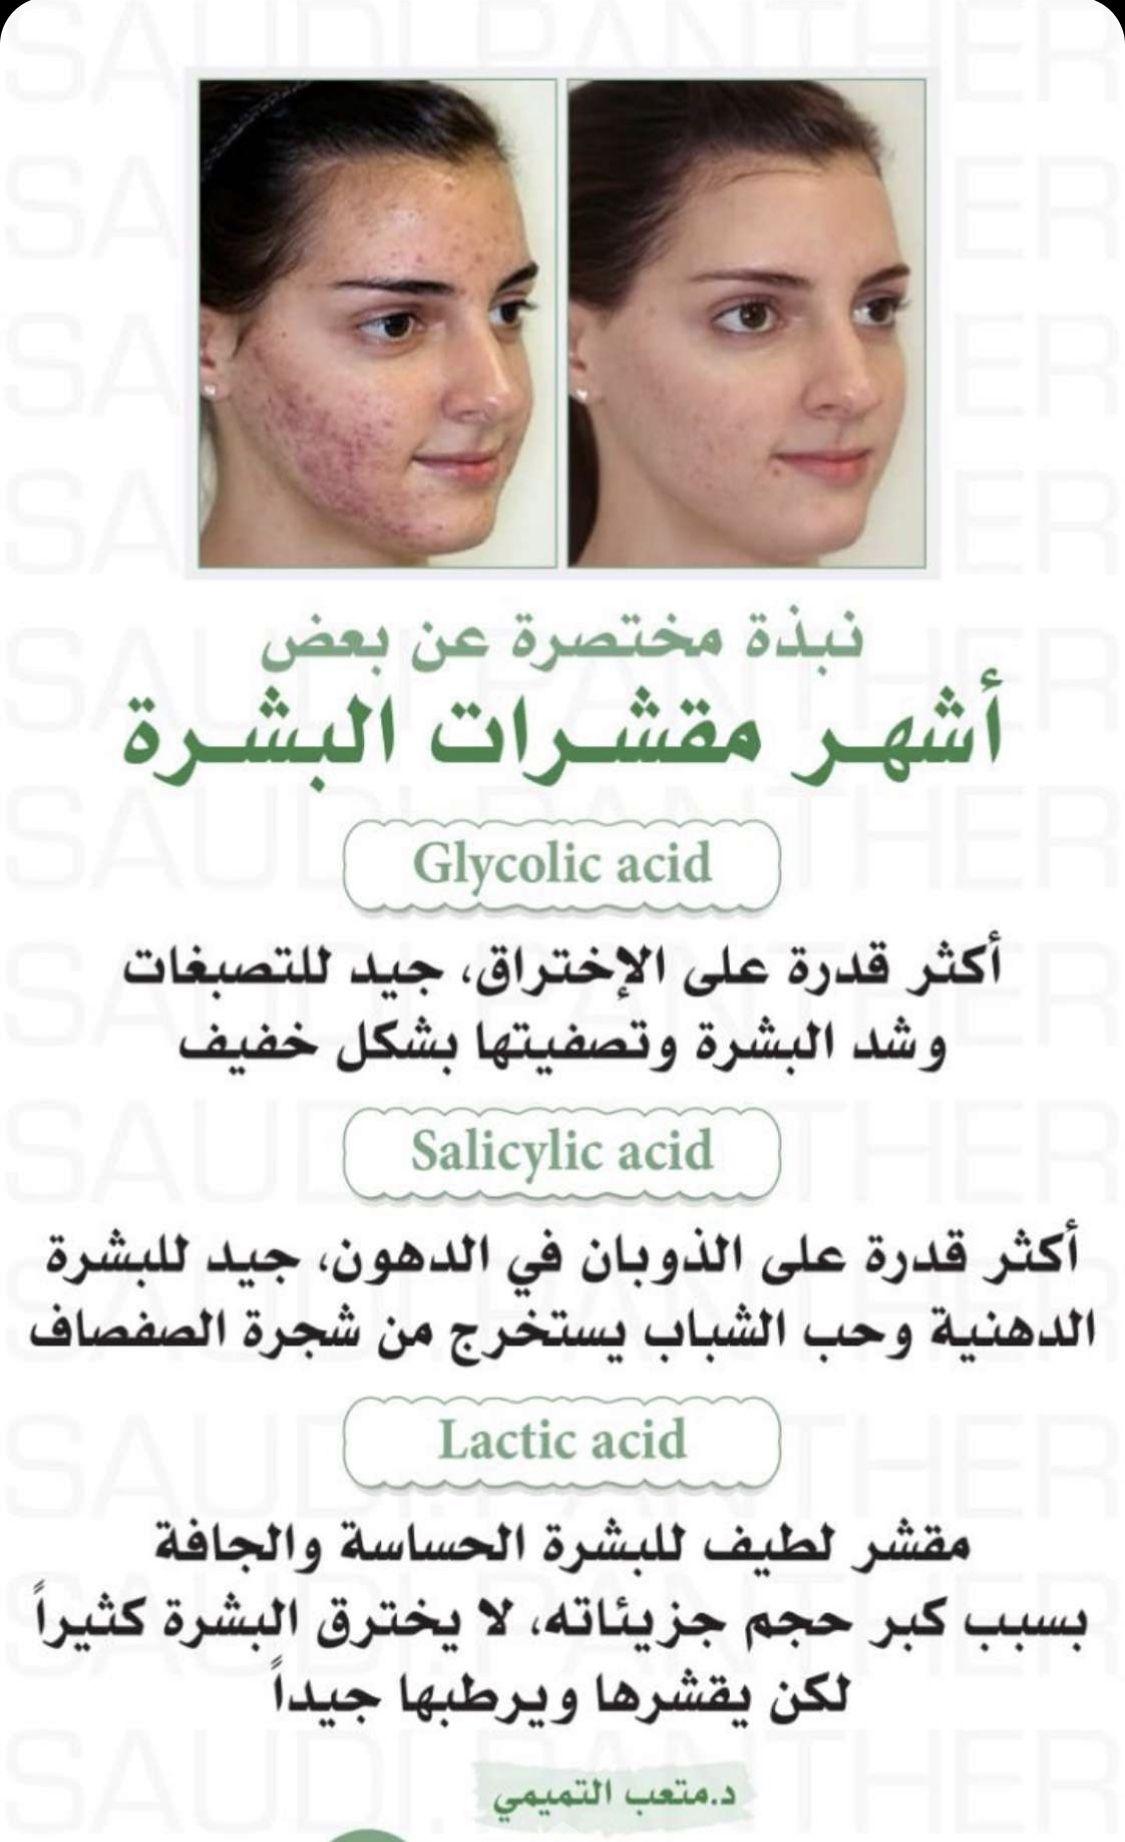 Pin By Shosho On Beaute Beauty Skin Care Routine Skin Care Basics Skin Treatment Diy